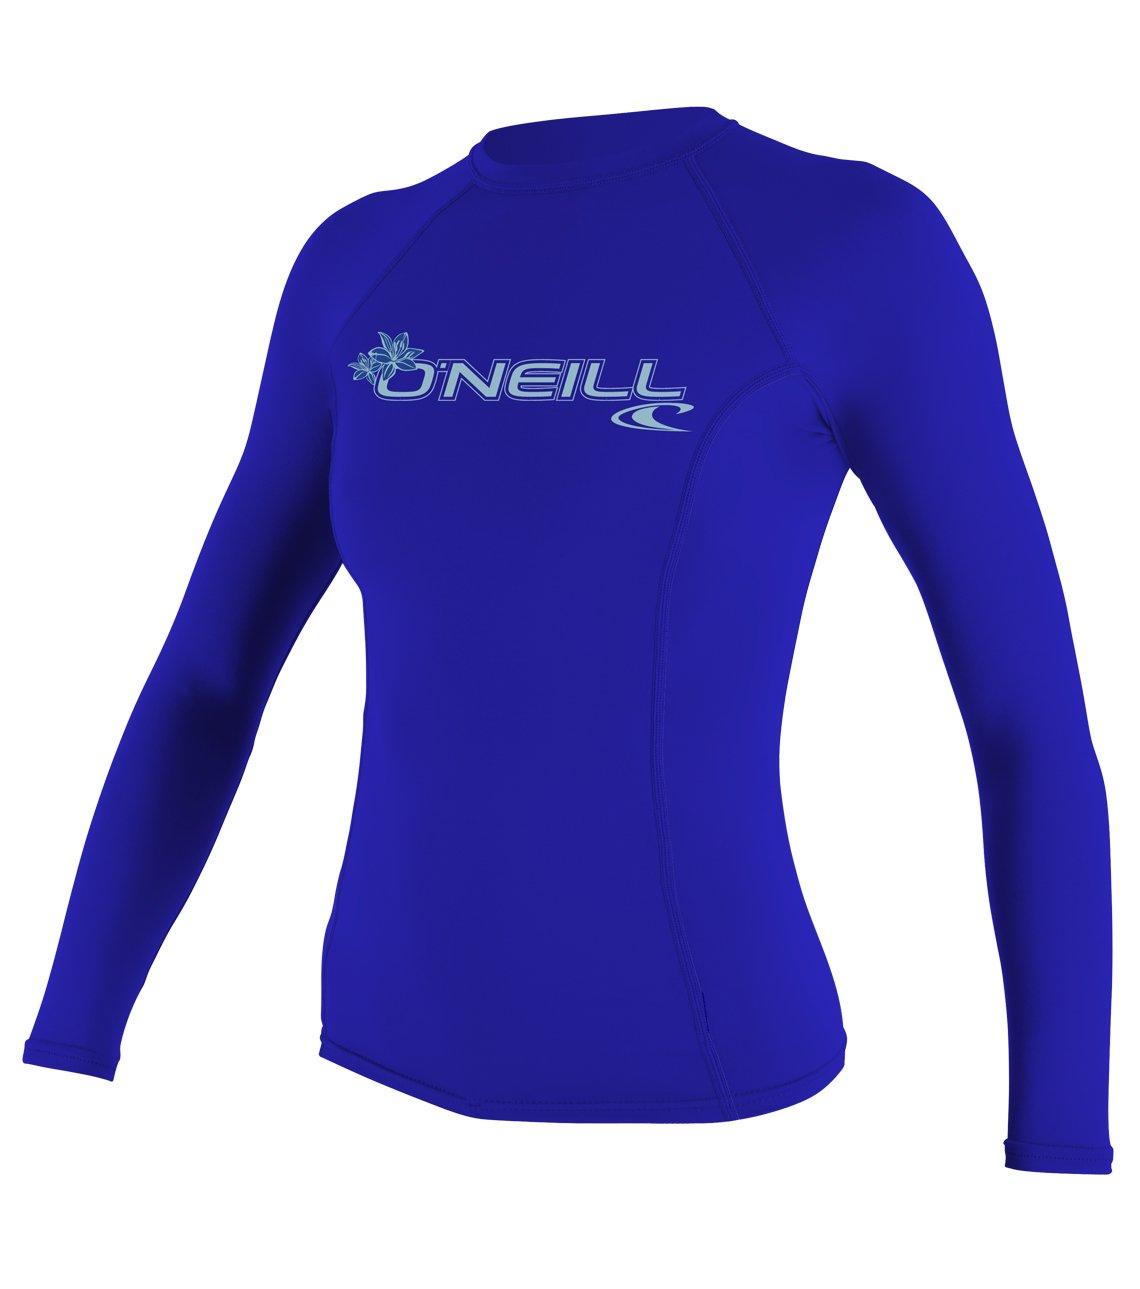 O'Neill Wetsuits UV Sun Protection Womens Basic Skins Long Sleeve Crew Sun Shirt Rash Guard, Tahitian Blue, Small by O'Neill Wetsuits